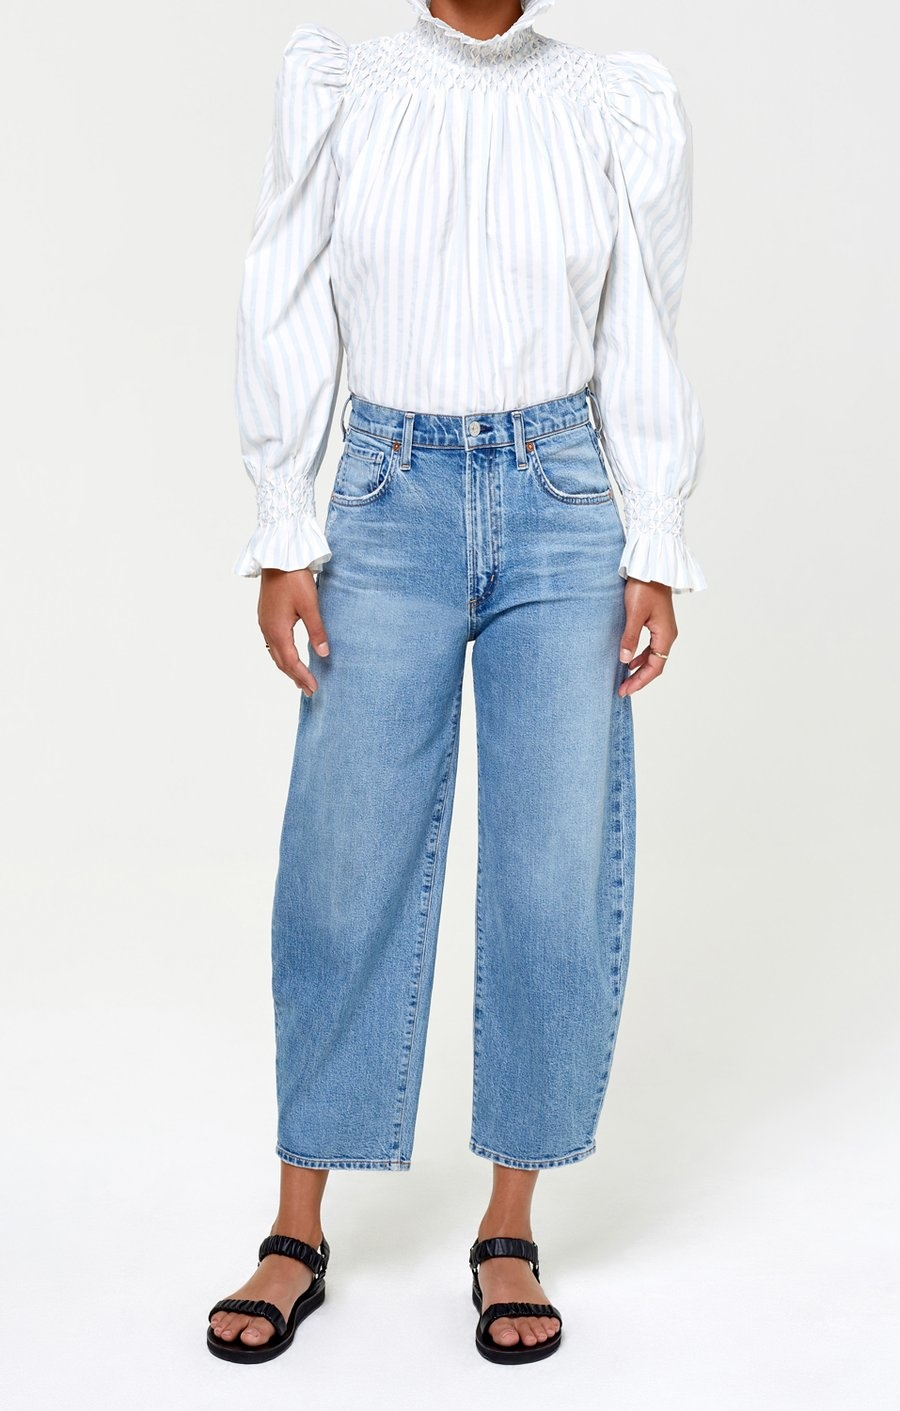 Calista jeans Daydream